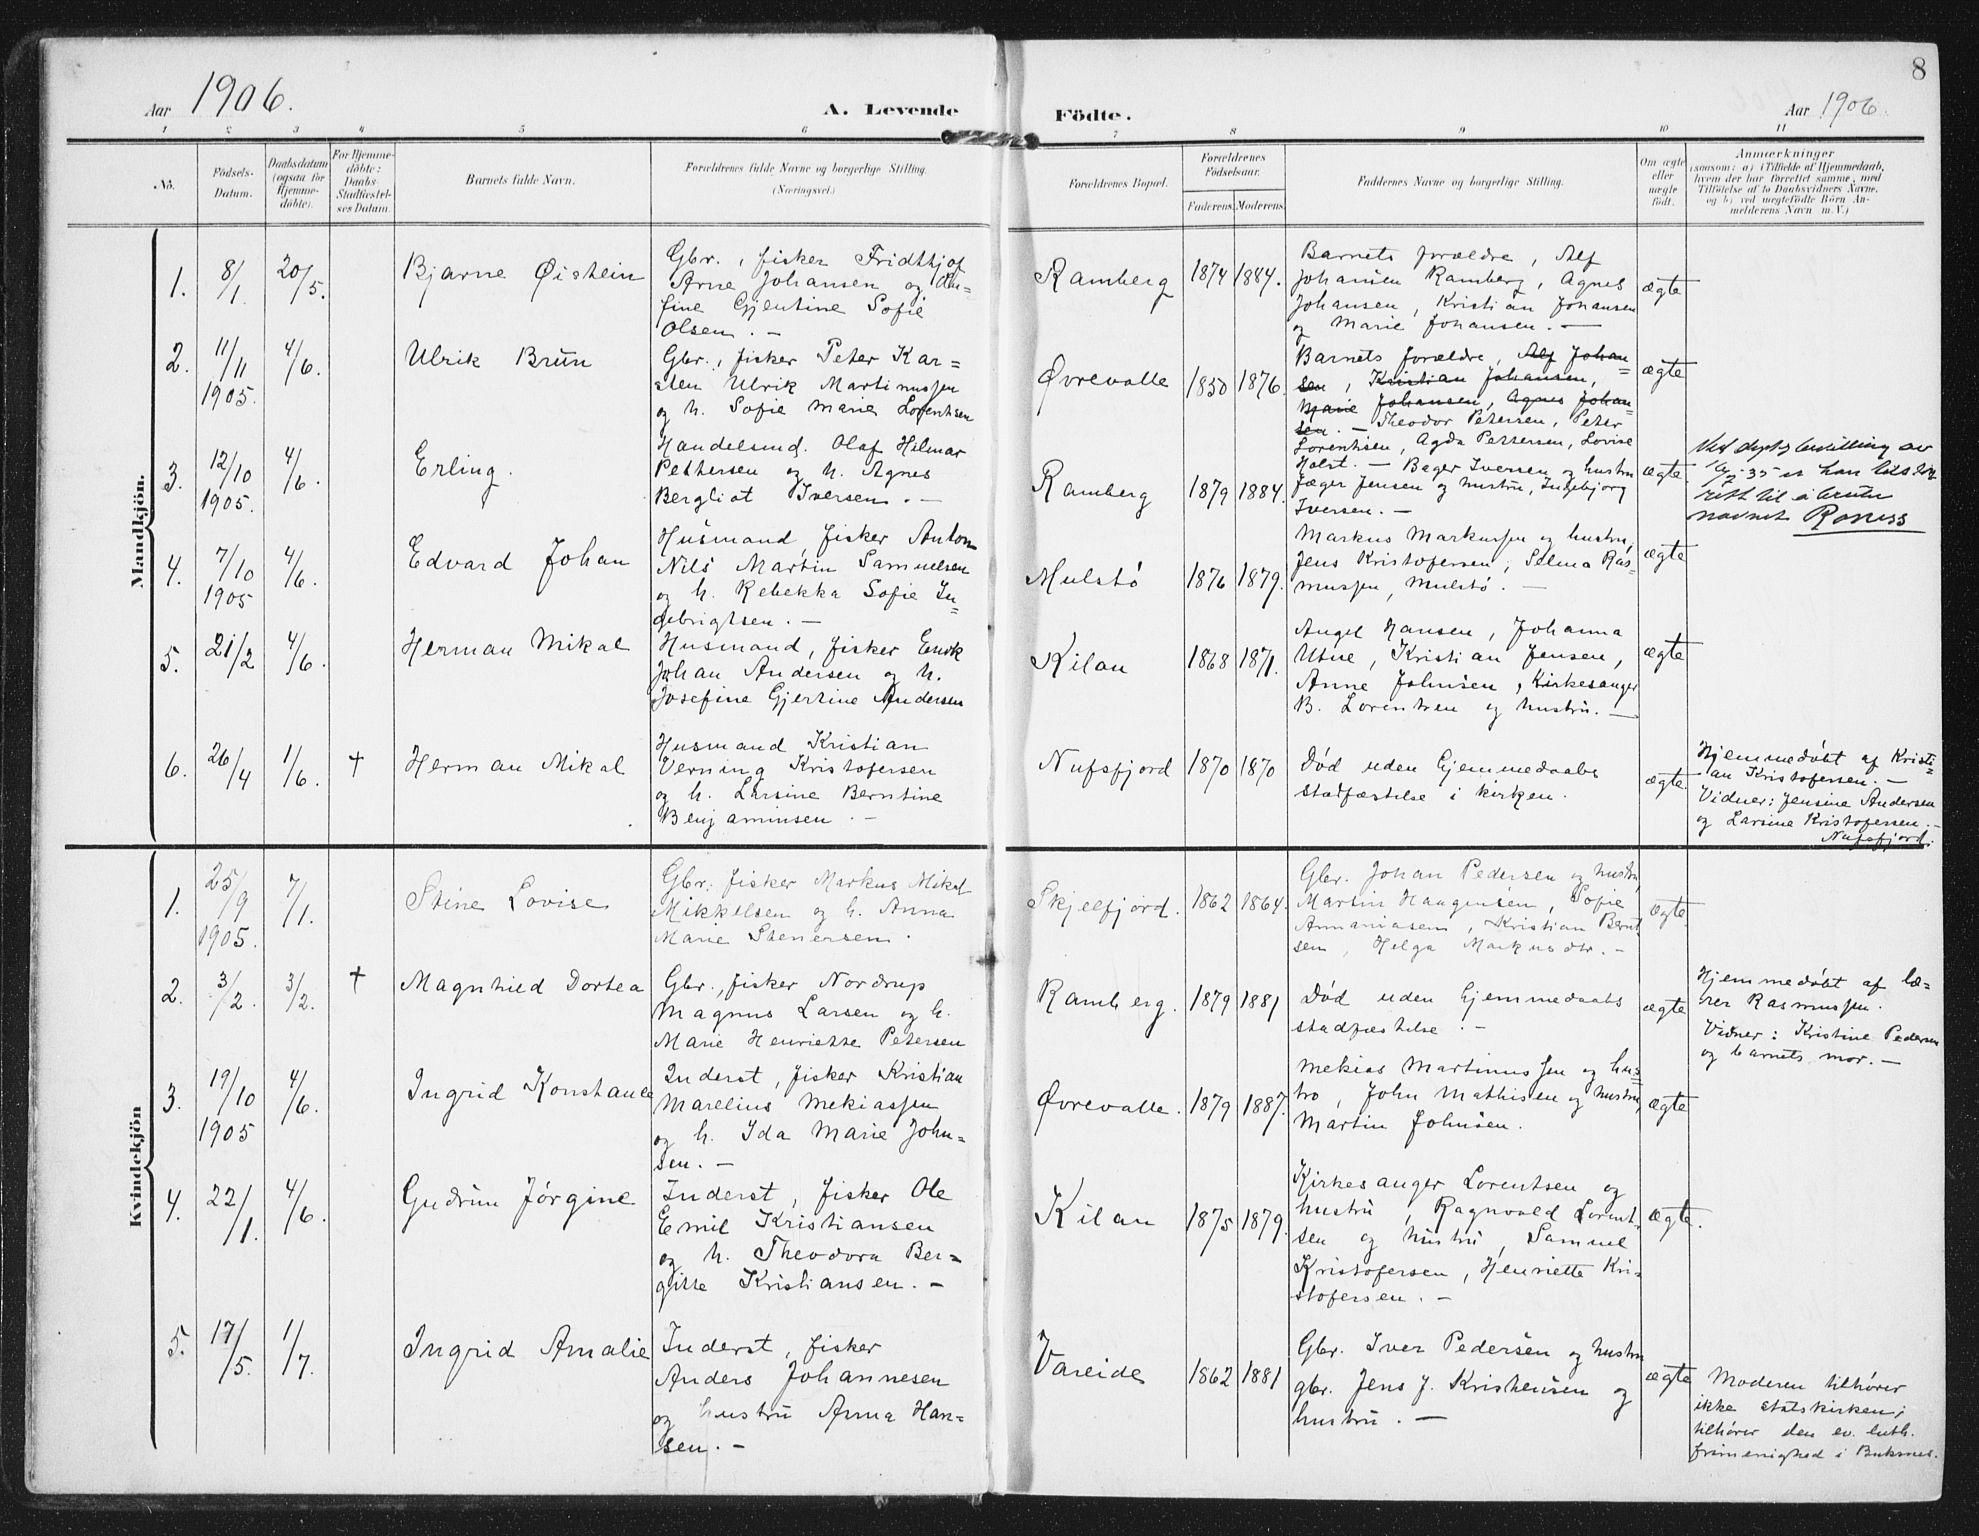 SAT, Ministerialprotokoller, klokkerbøker og fødselsregistre - Nordland, 885/L1206: Ministerialbok nr. 885A07, 1905-1915, s. 8